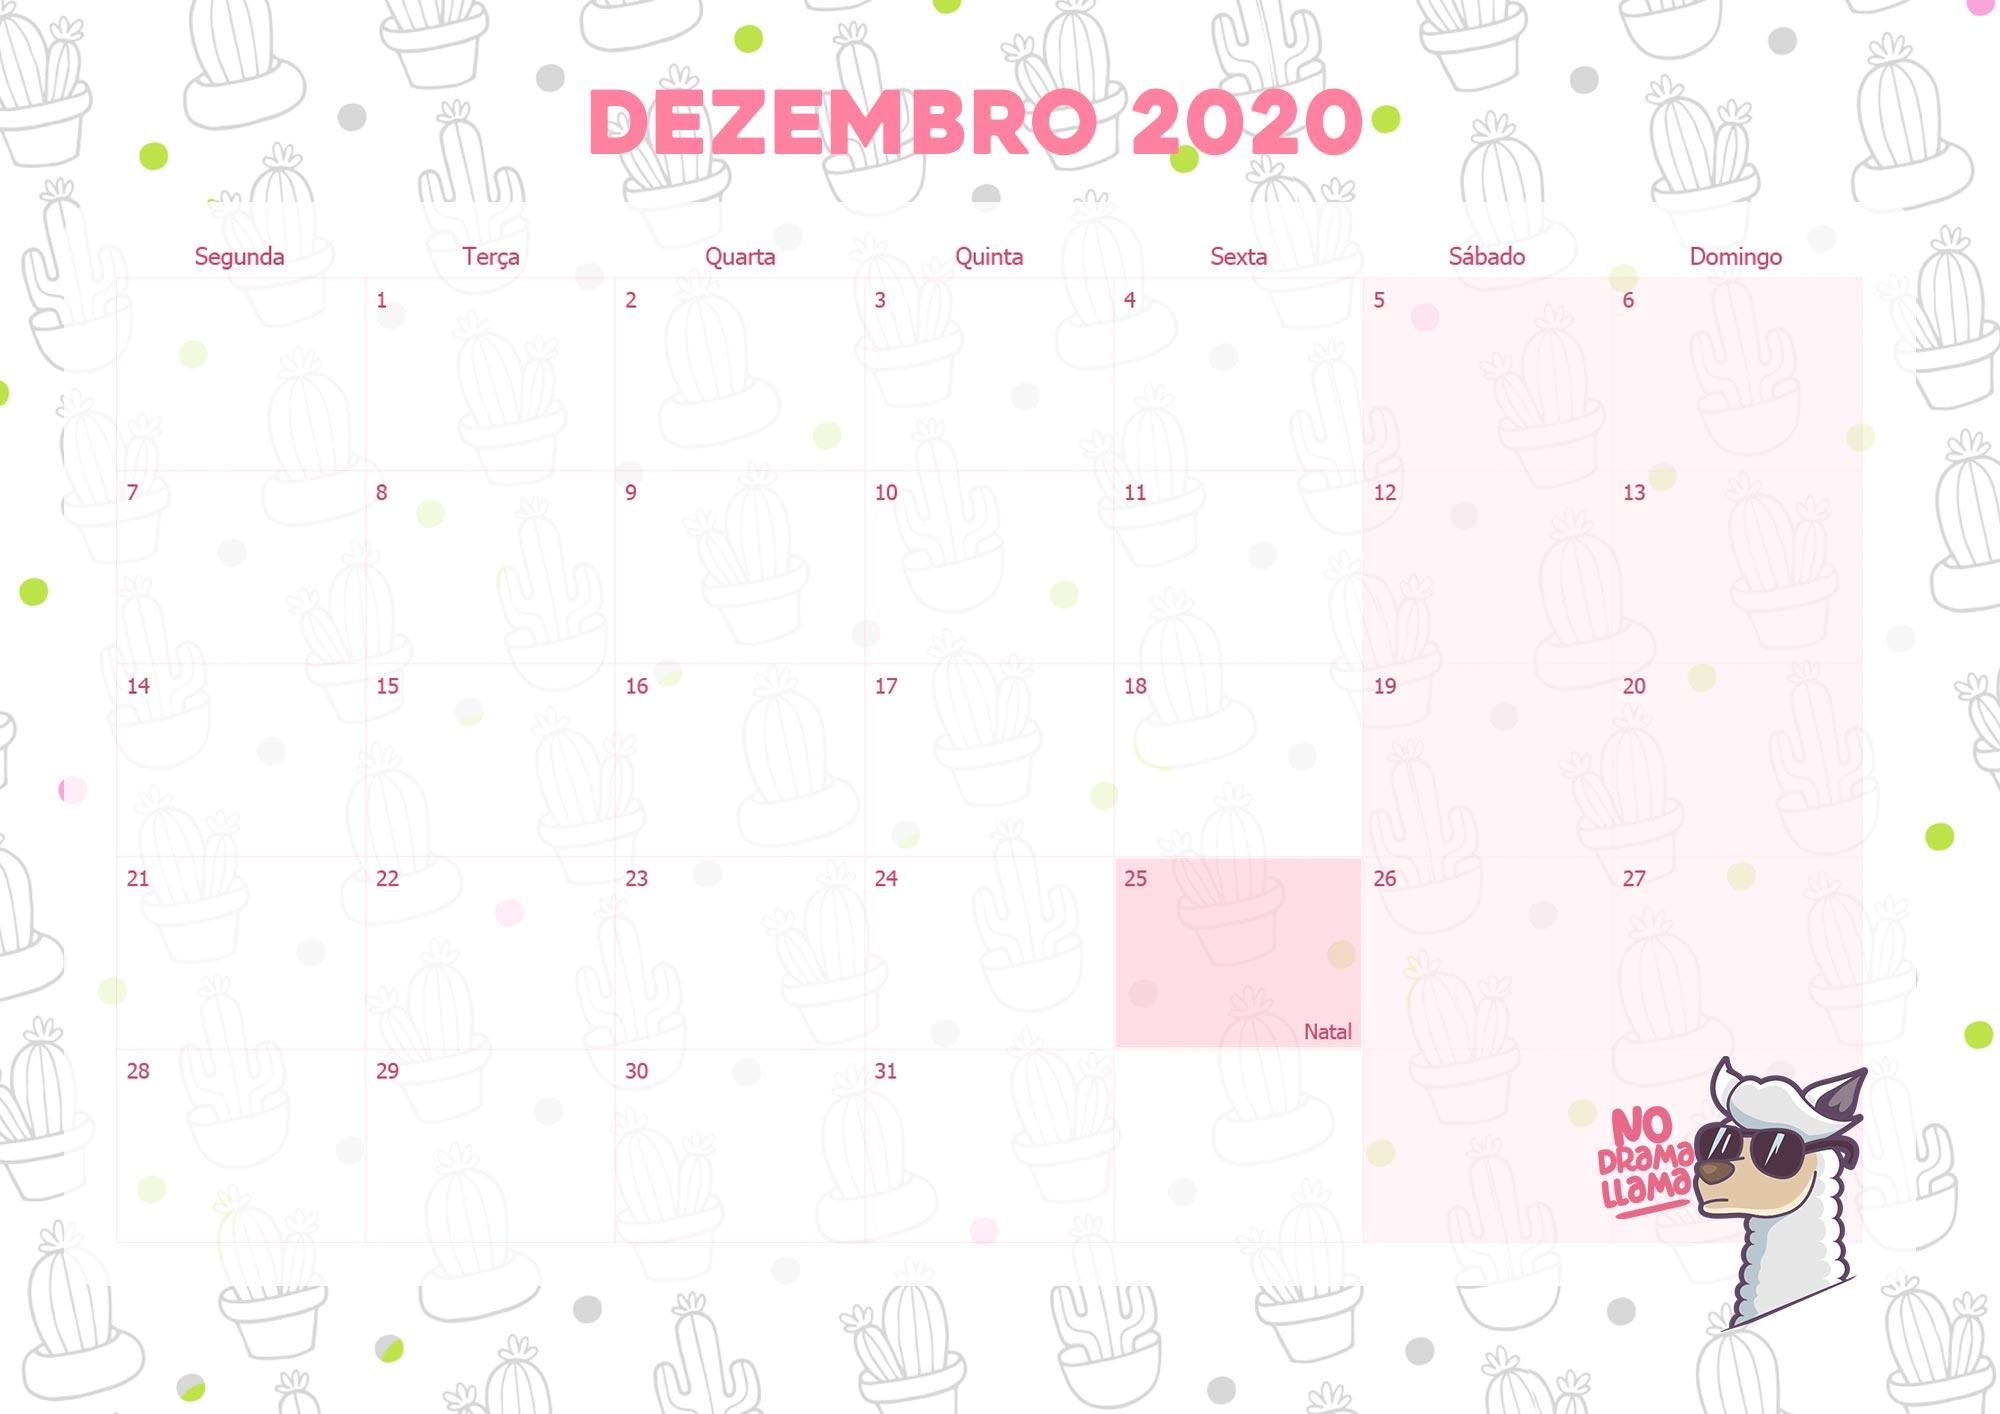 Calendario Mensal Lhama Drama 2020 Dezembro